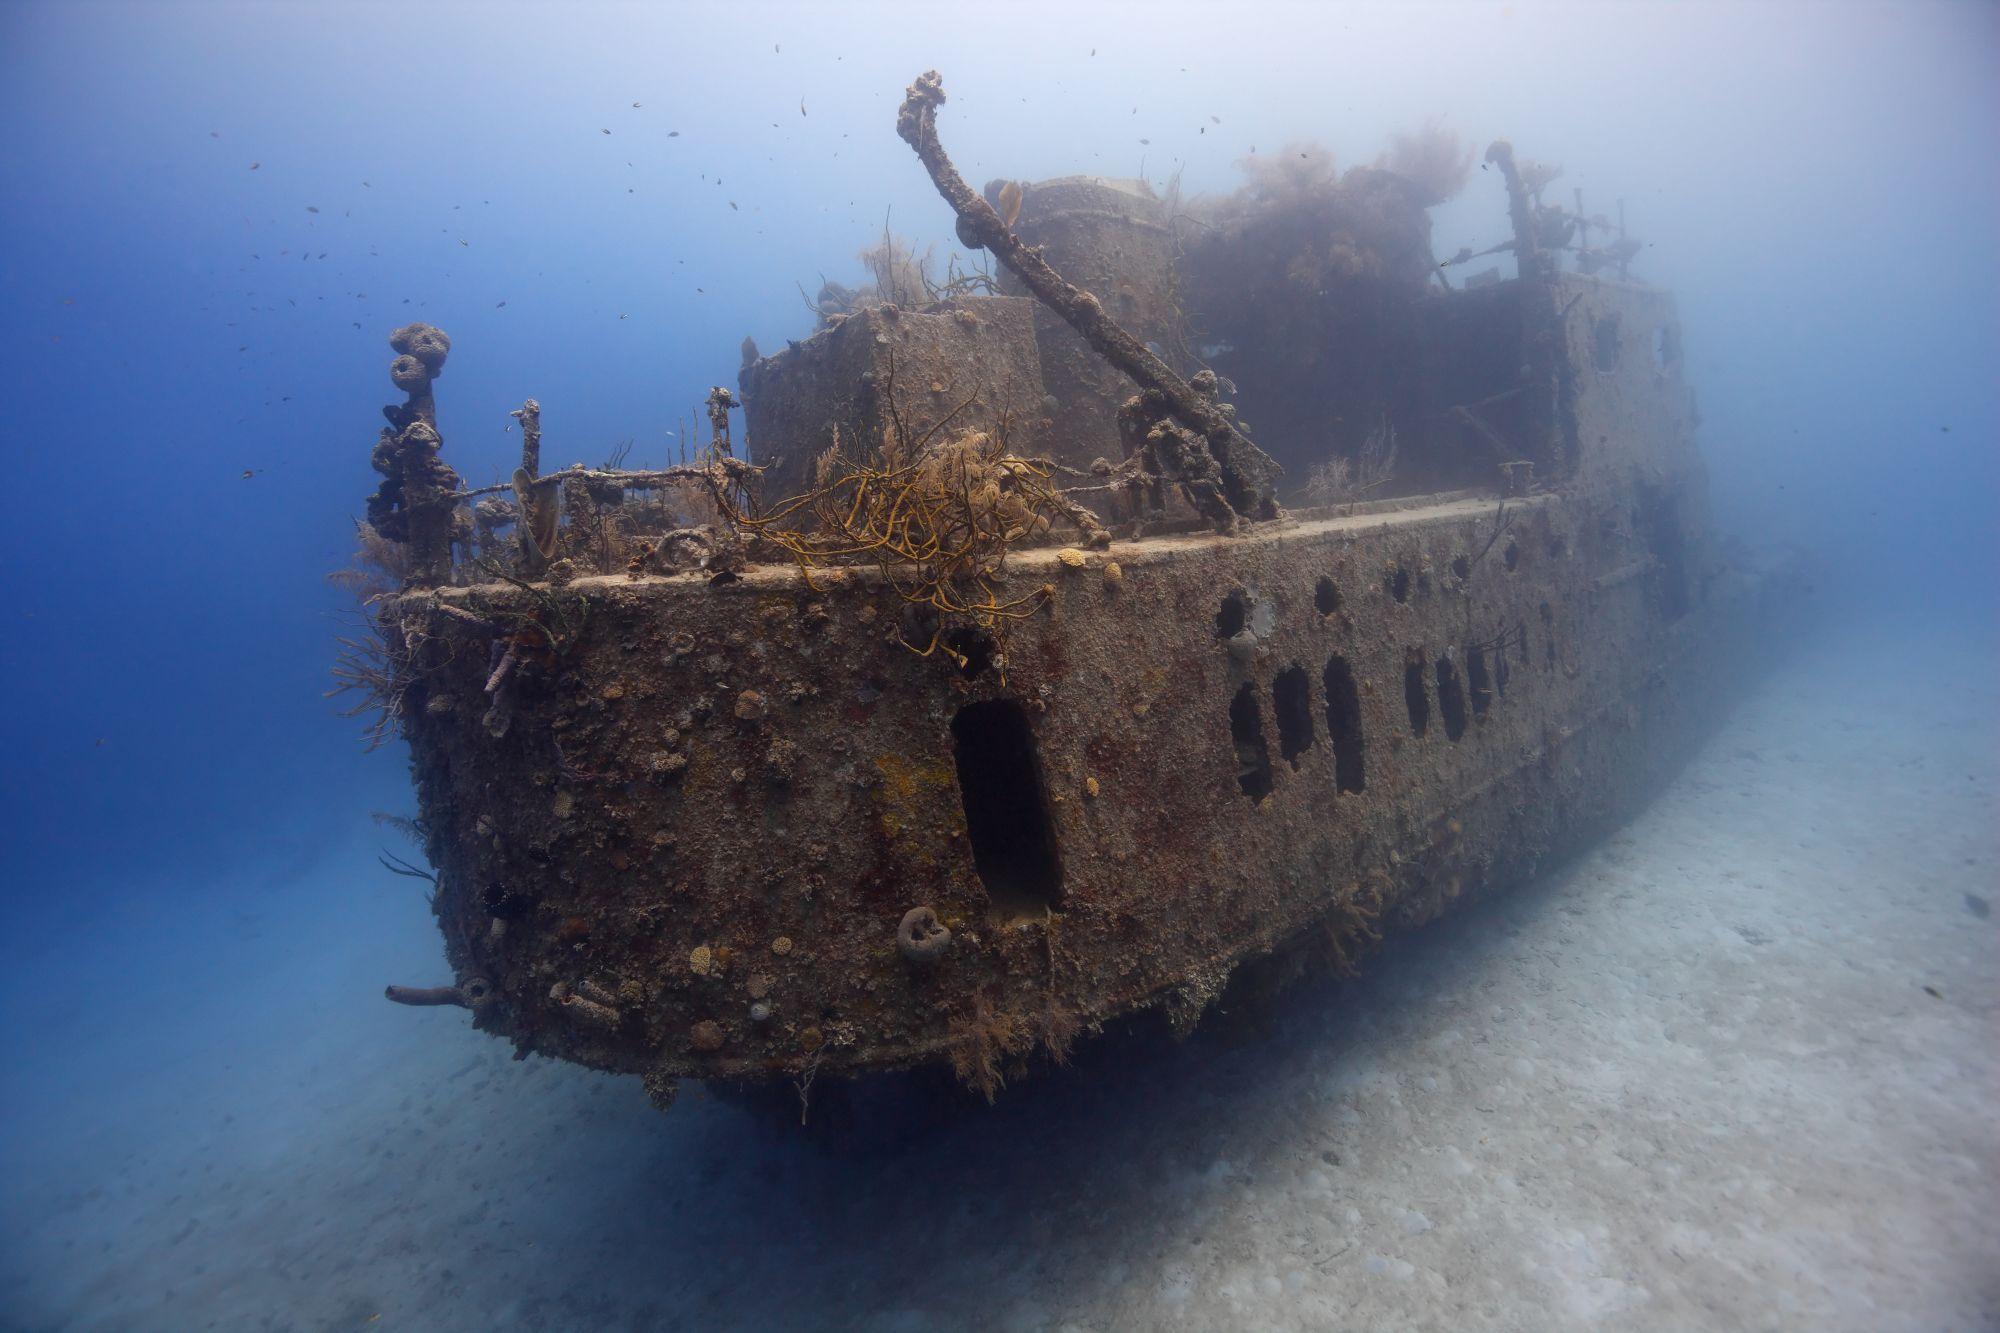 Scuba diving in prince albert wreck, - dive site - divebooke.